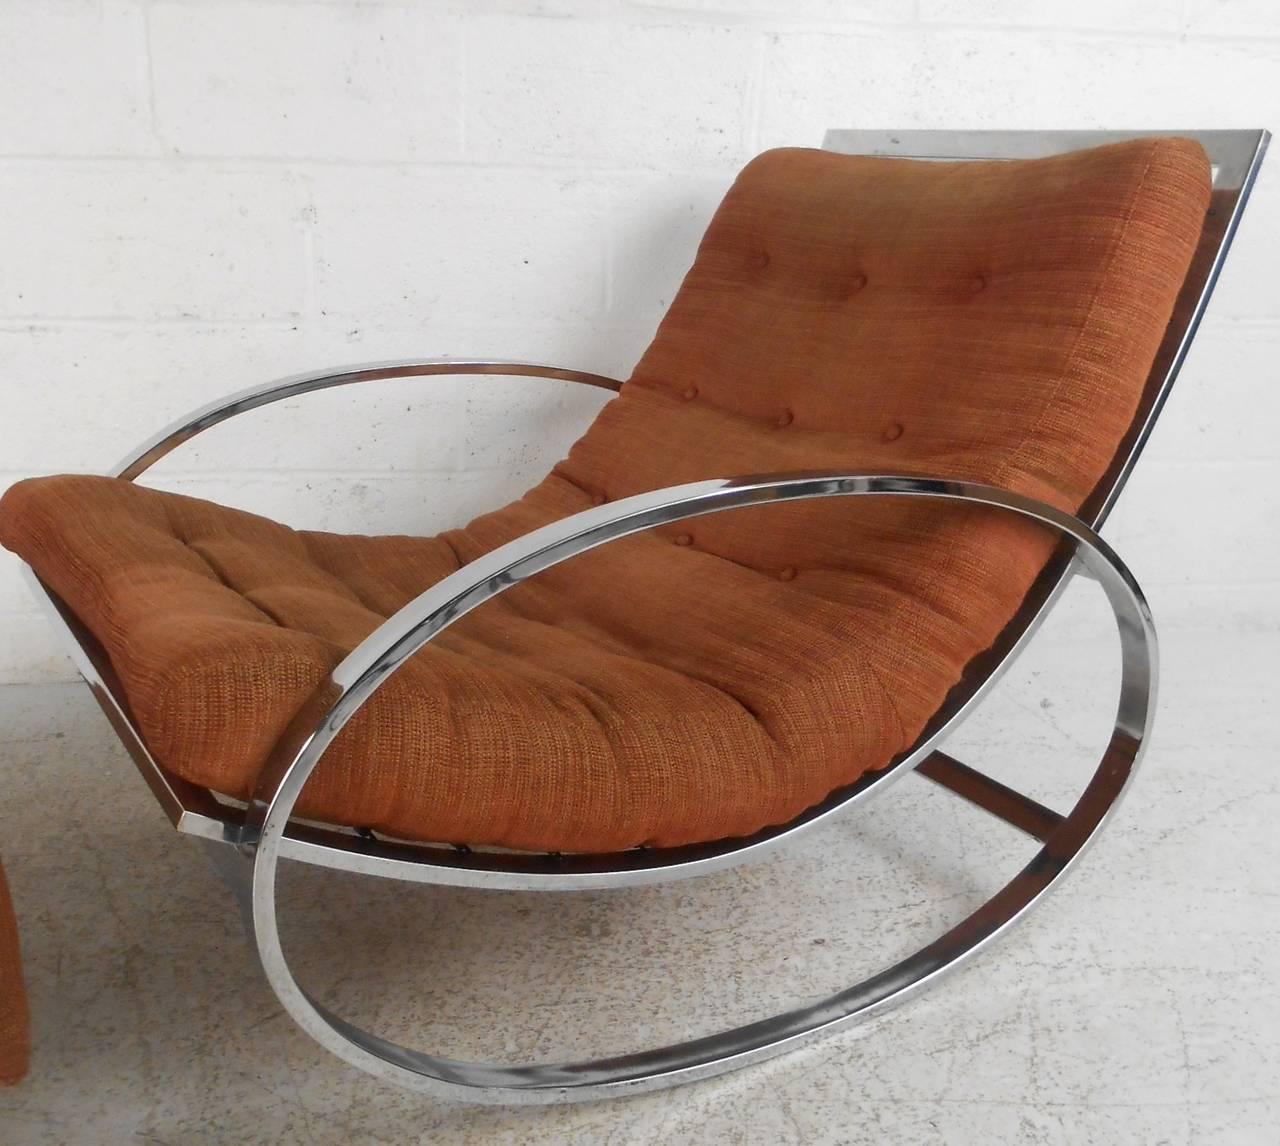 Milo Baughman Style Mid-Century Modern Renato Zevi Ellipse Chair and Ottoman 6